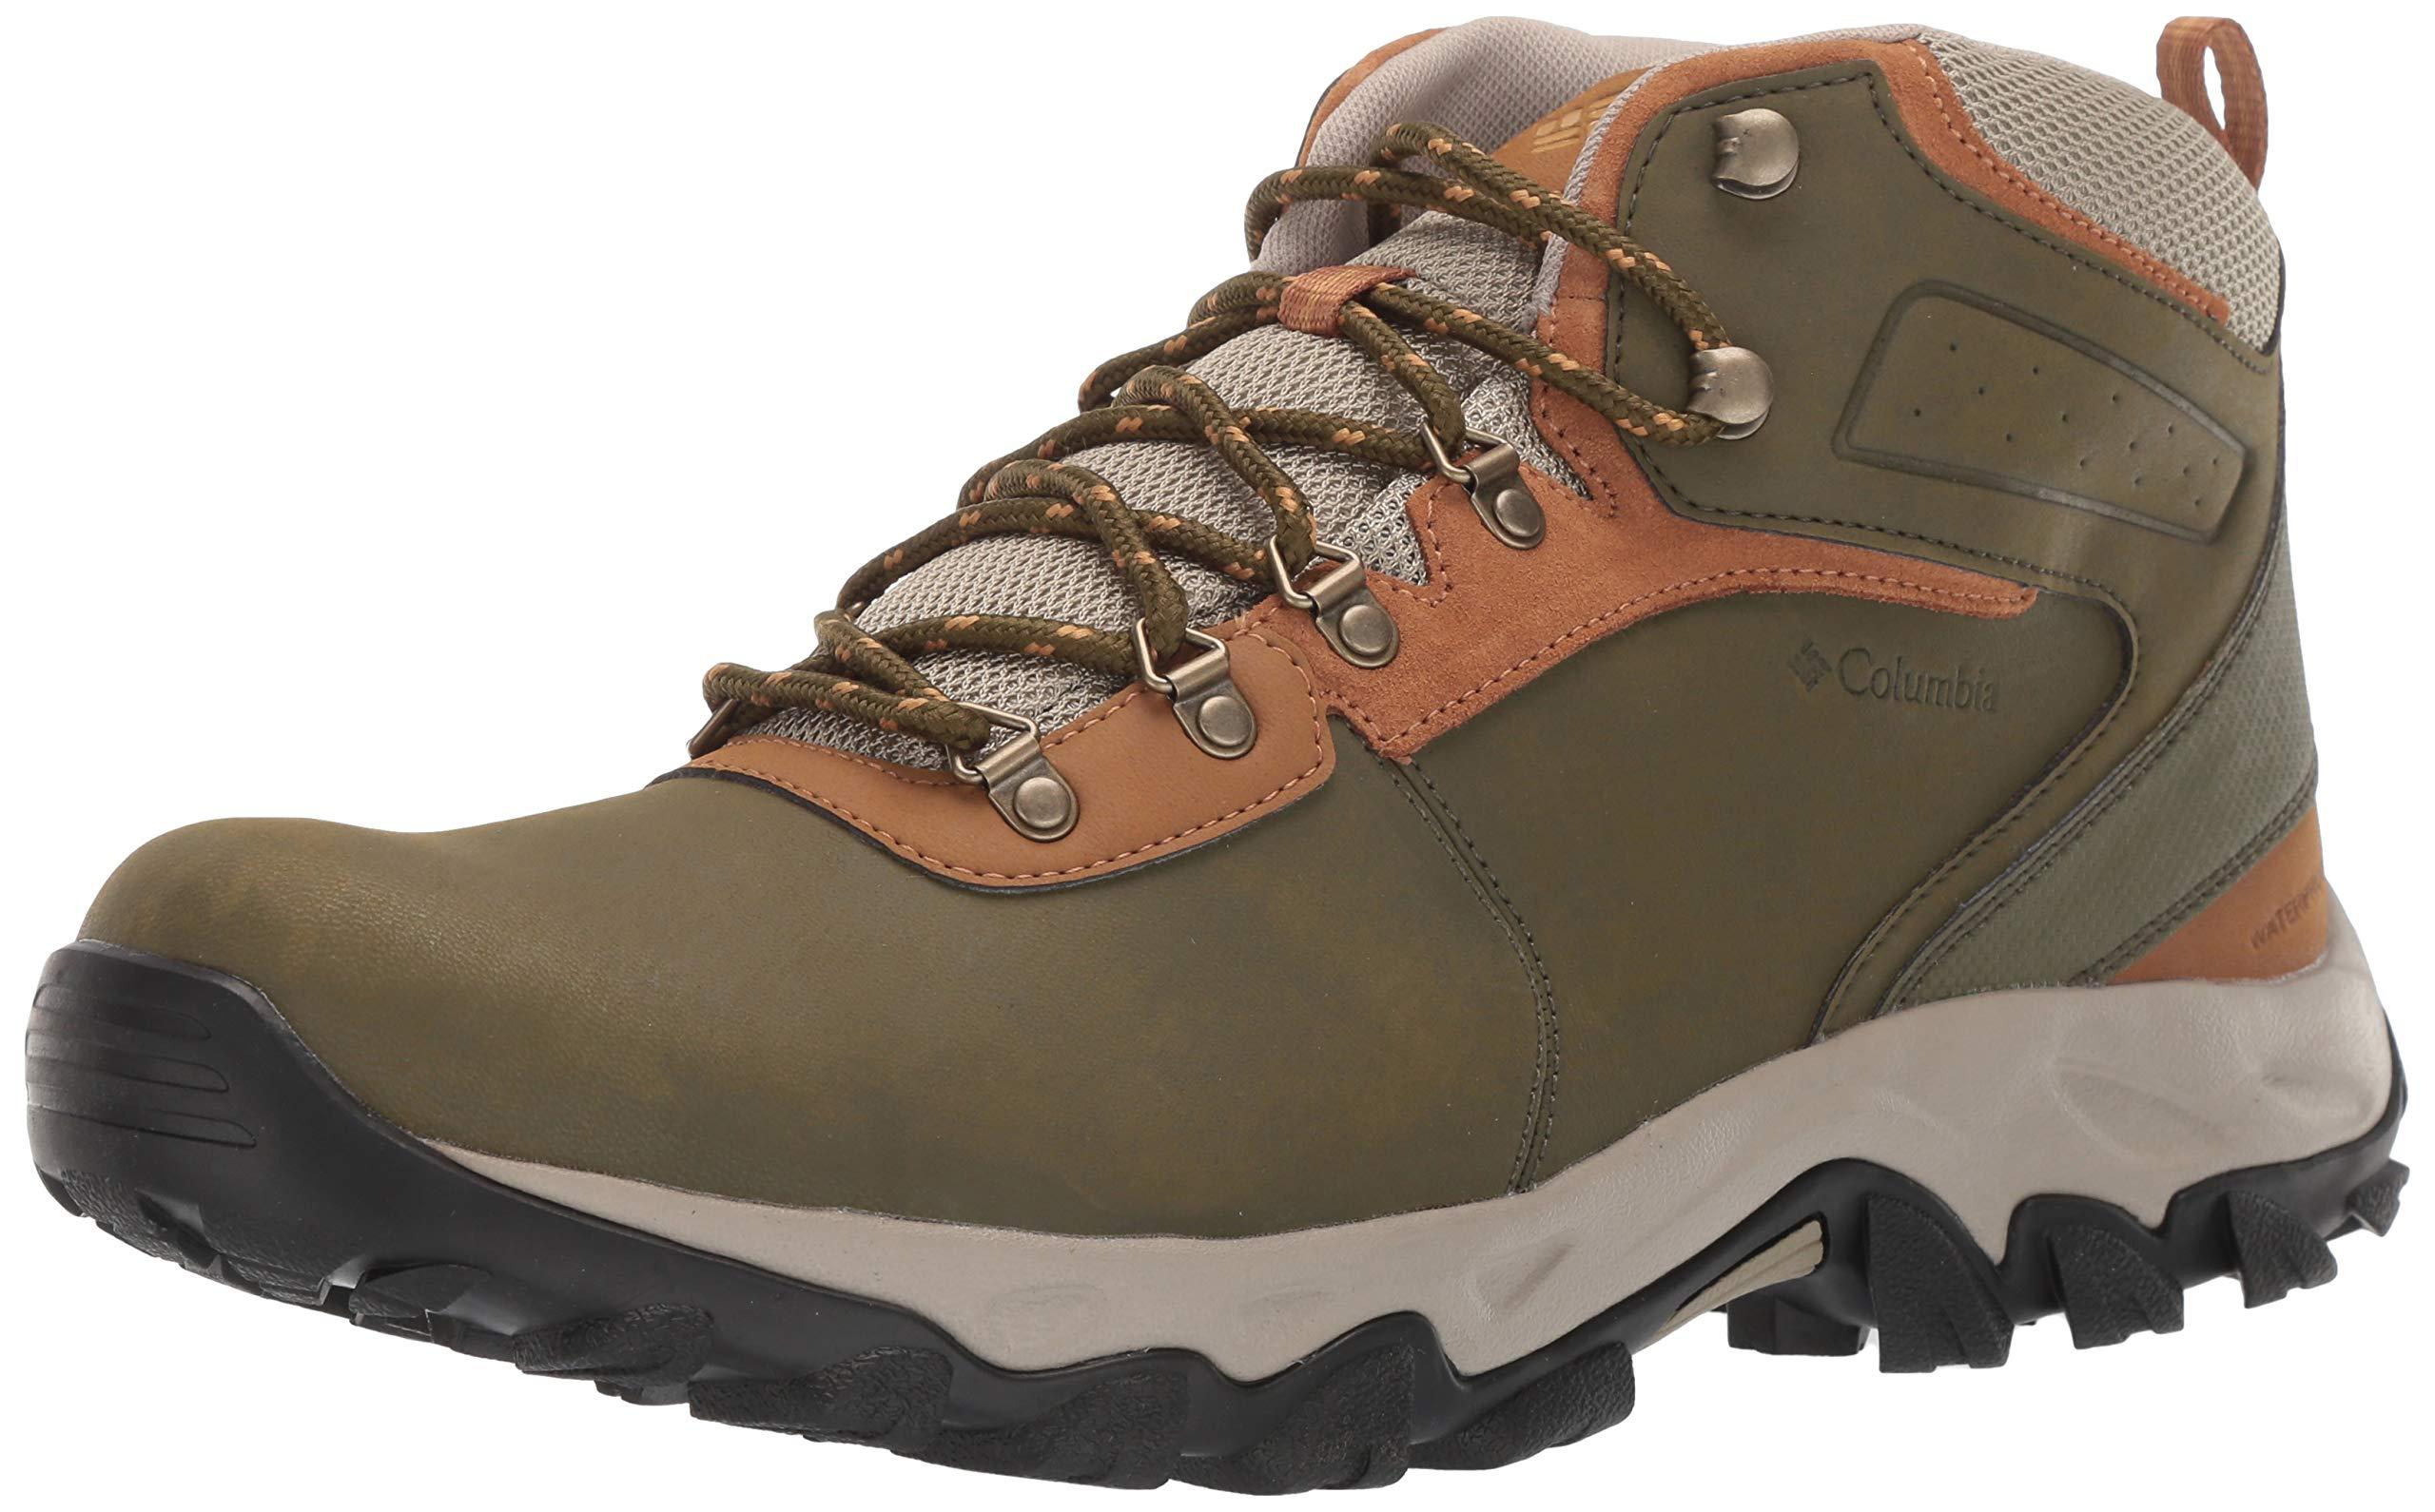 Columbia Men's Newton Ridge Plus II Waterproof Ankle Boot, Silver sage, Dark Banana, 11.5 Regular US